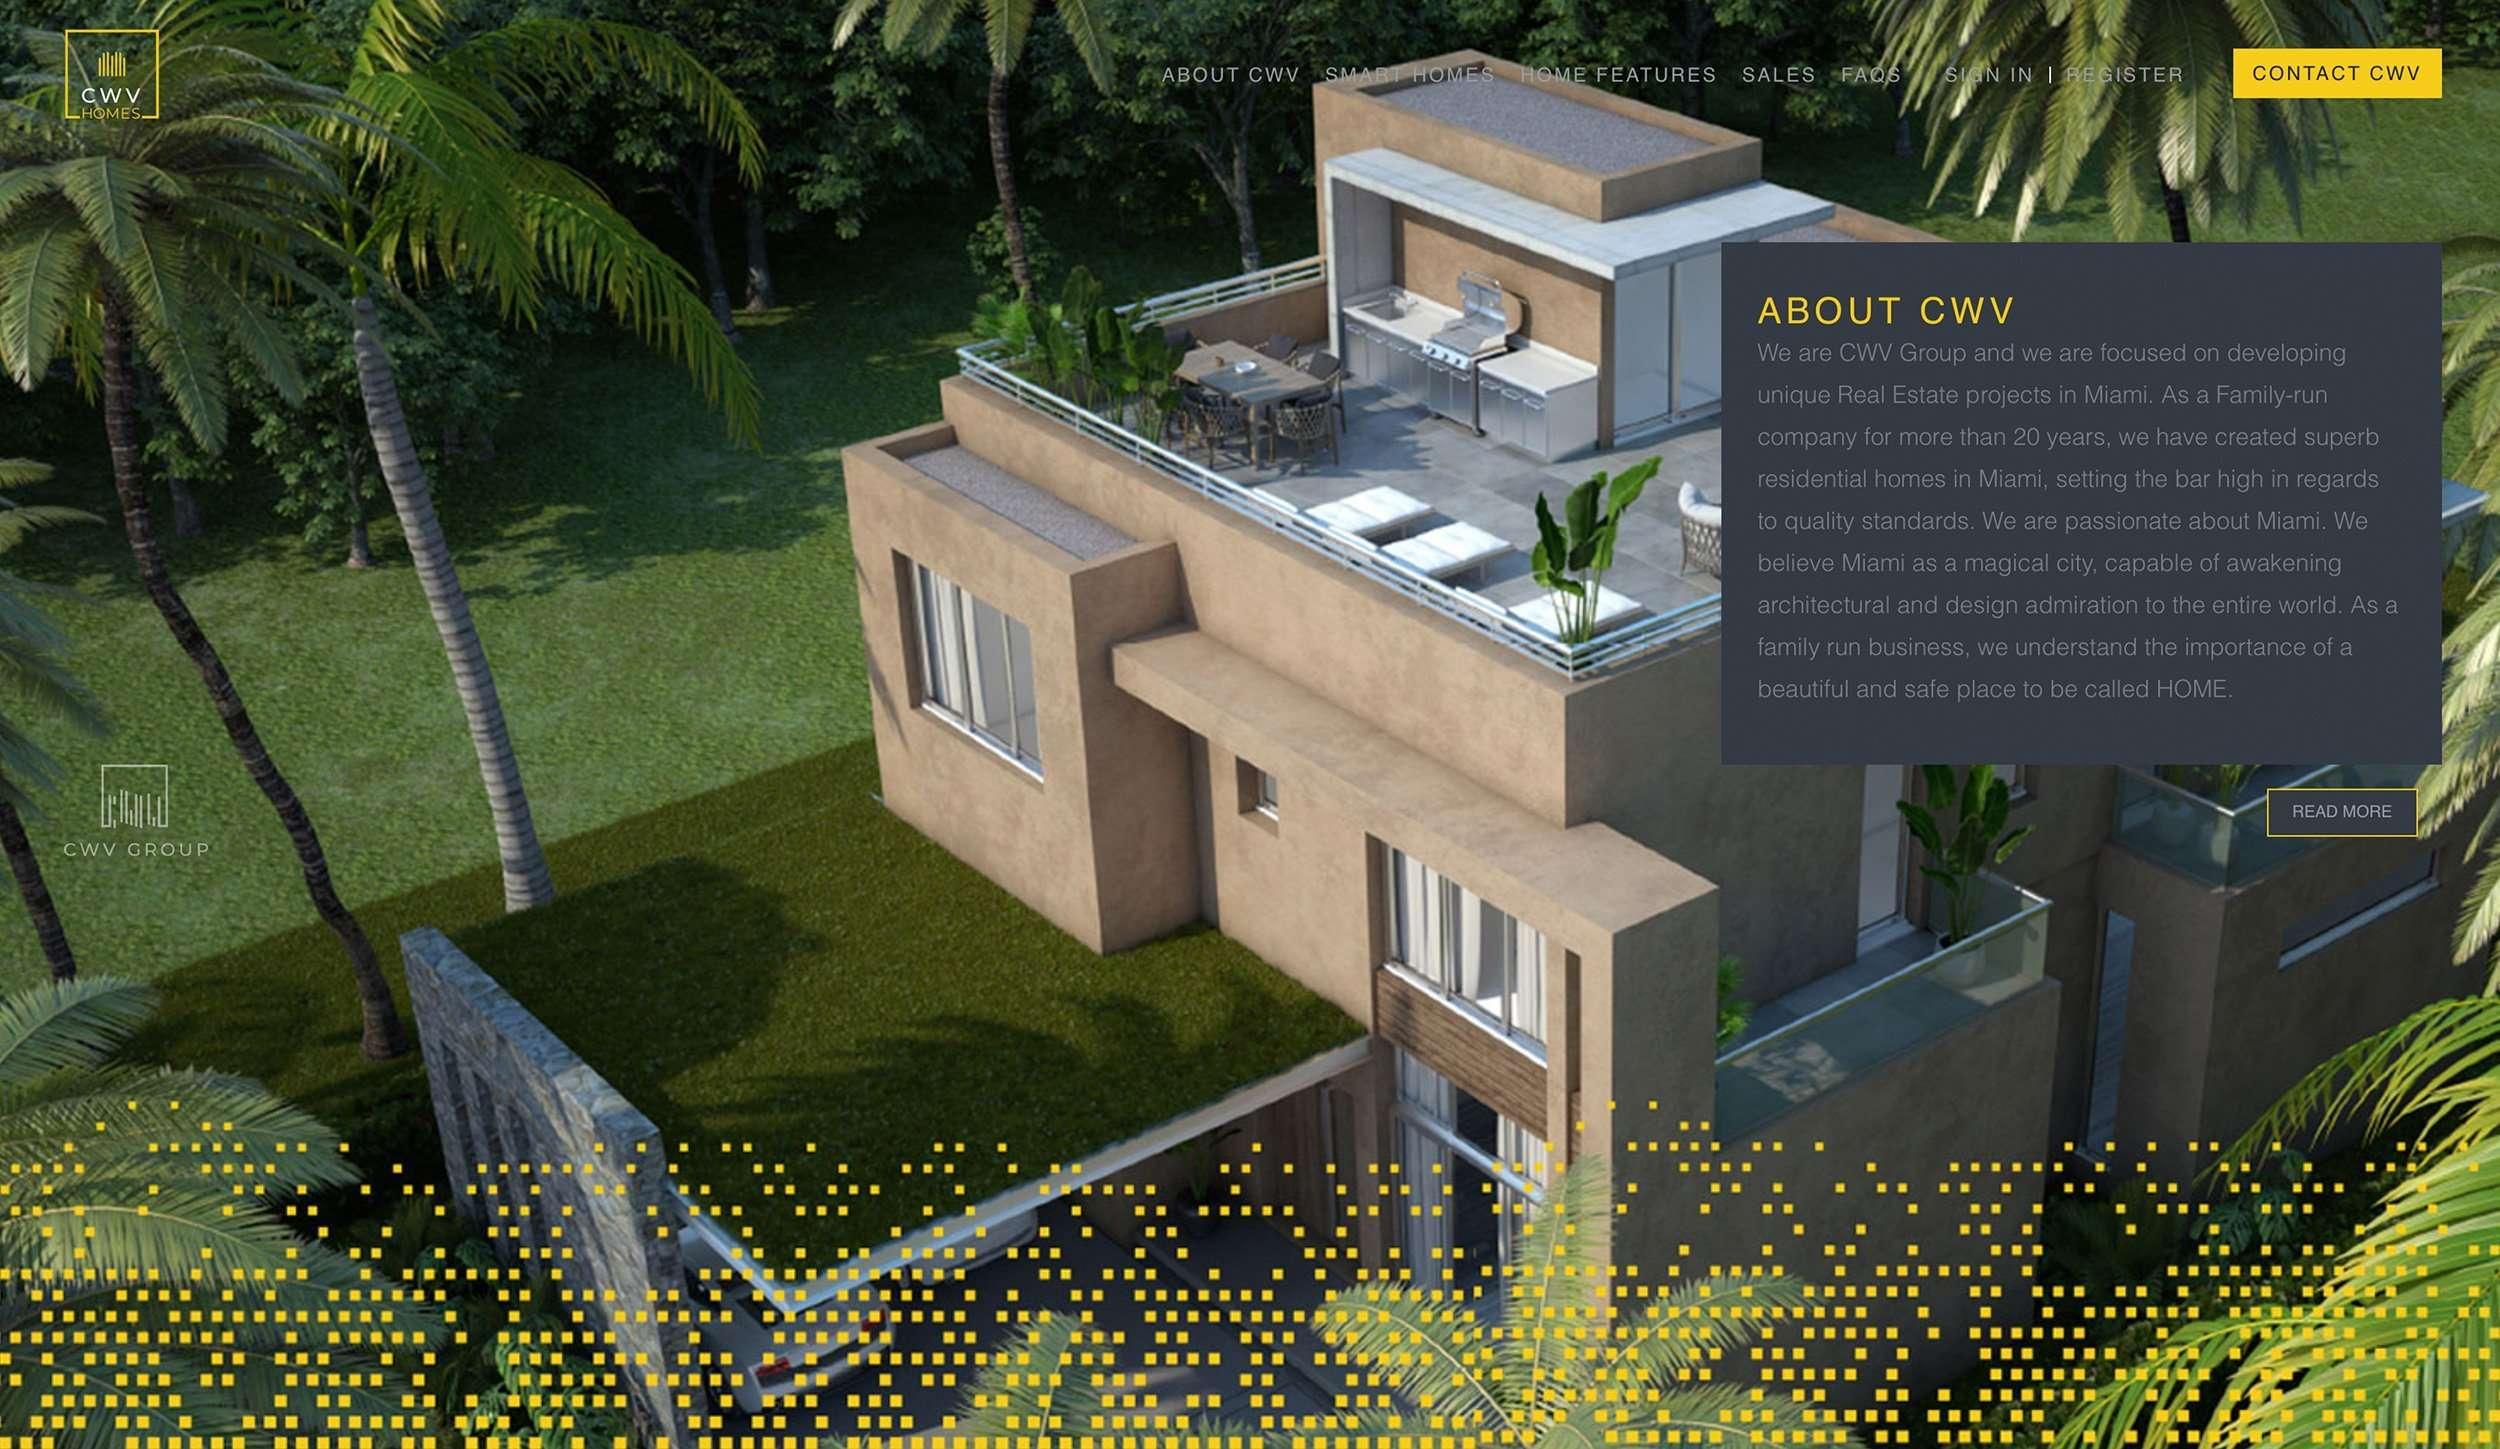 cwv-group-miami-usa-estados-unidos-real-estate-online-lab-lisbon-web-development-web-design-17